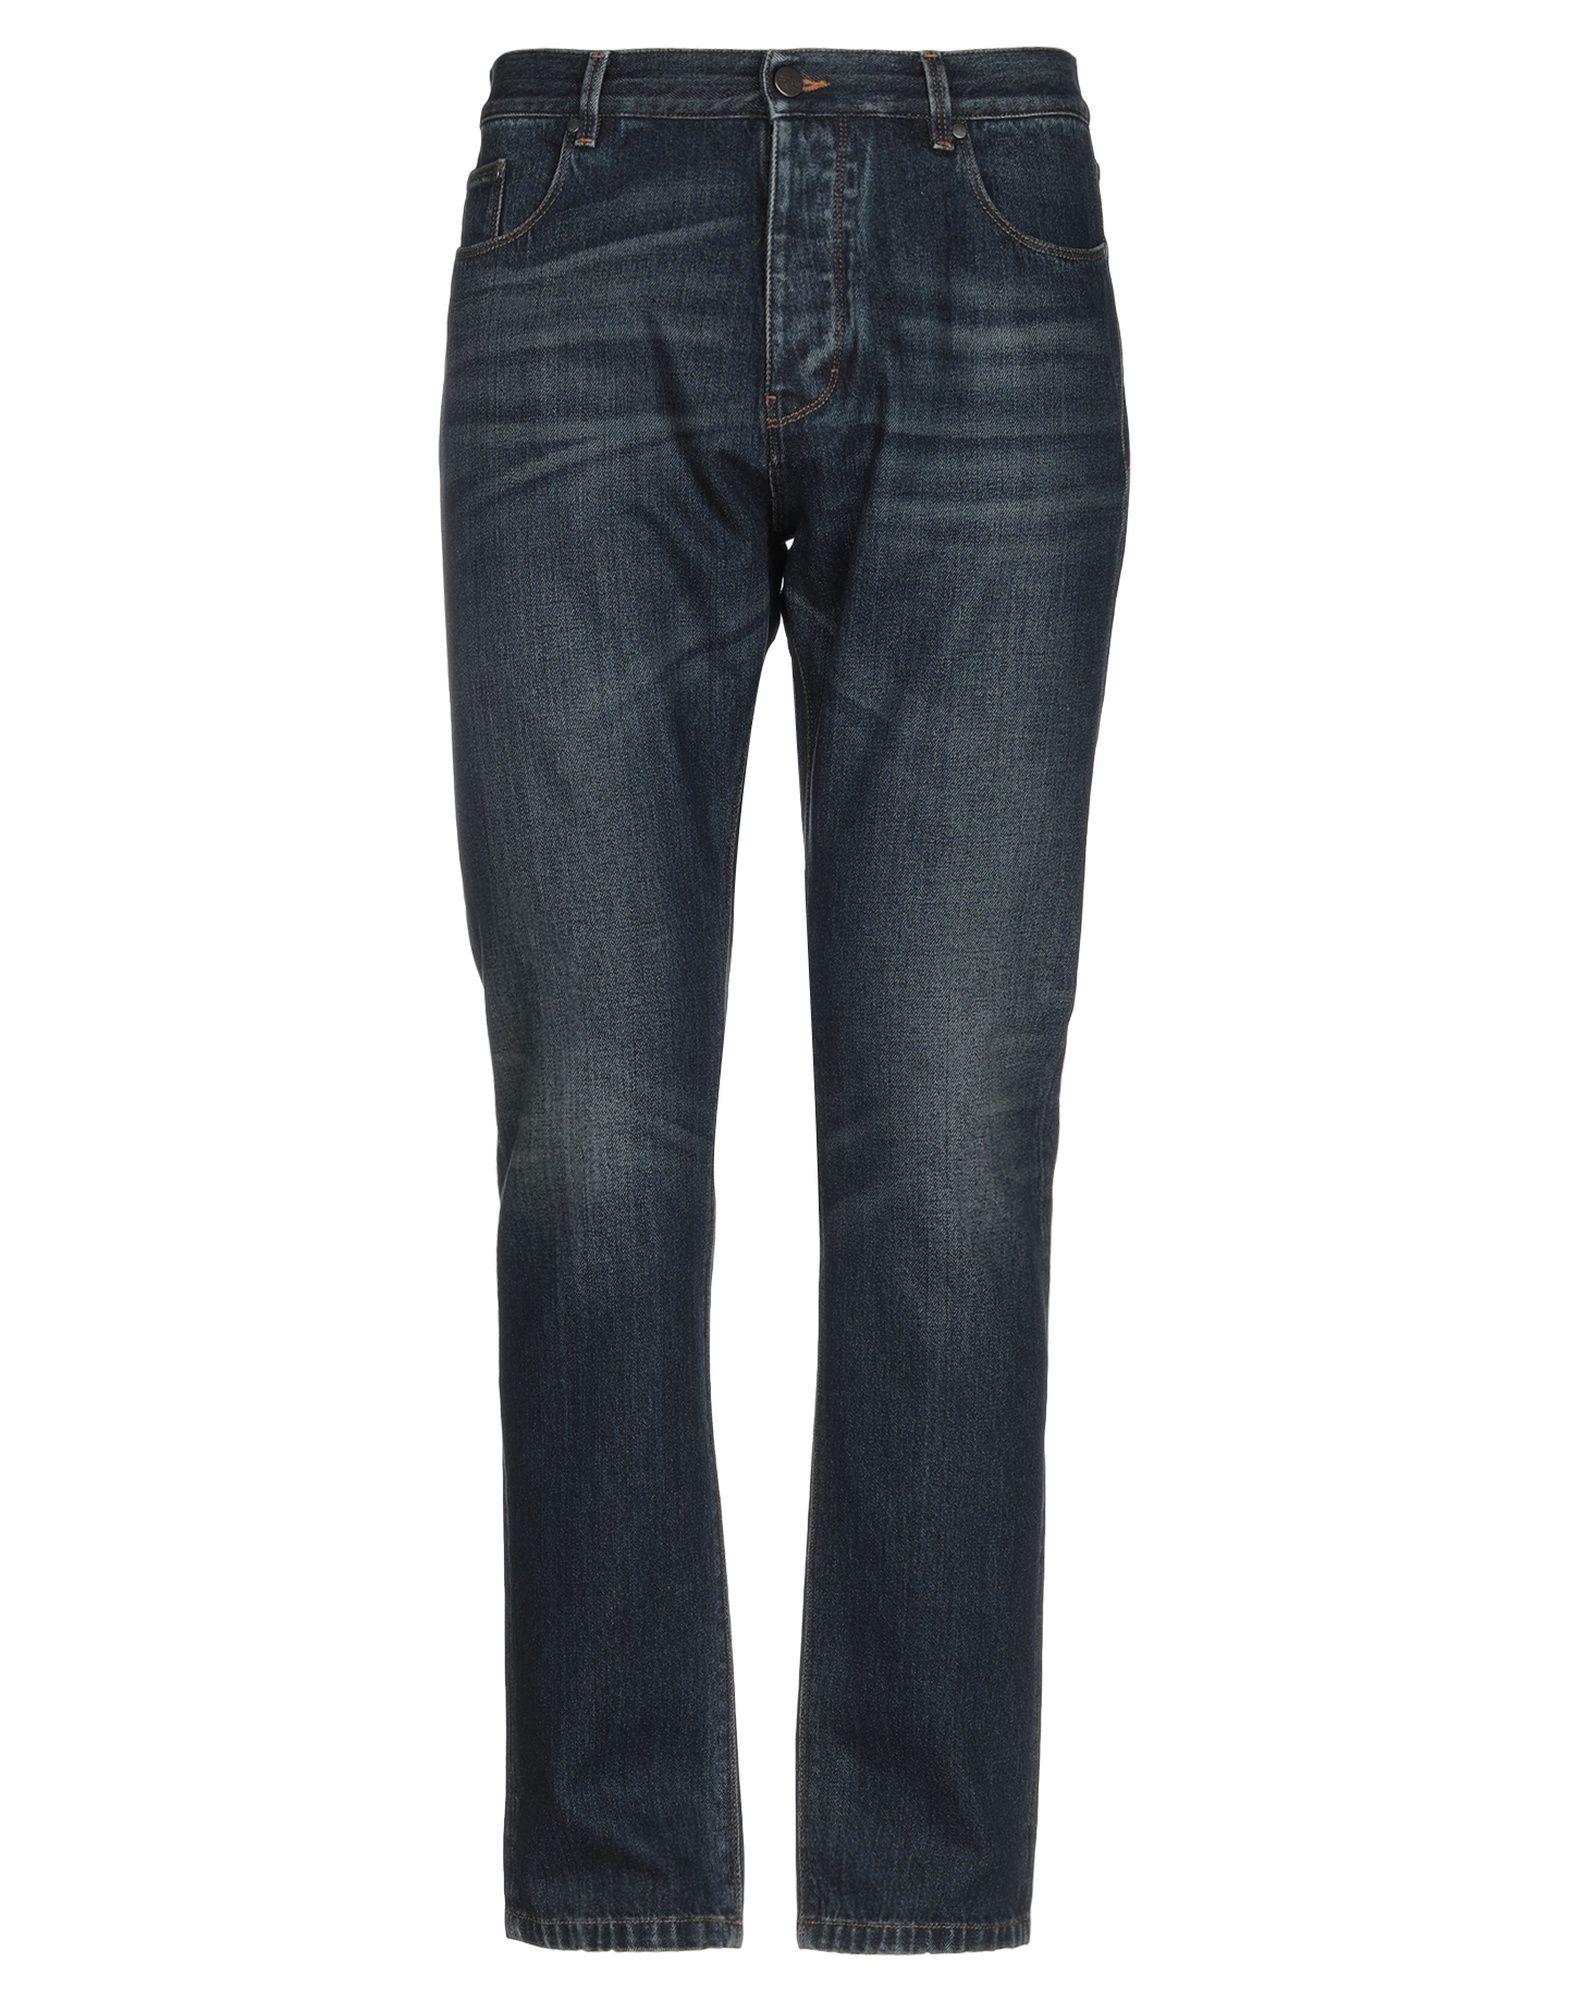 Pantaloni Jeans Roberto Cavalli uomo - 42726443KR 42726443KR 42726443KR adc